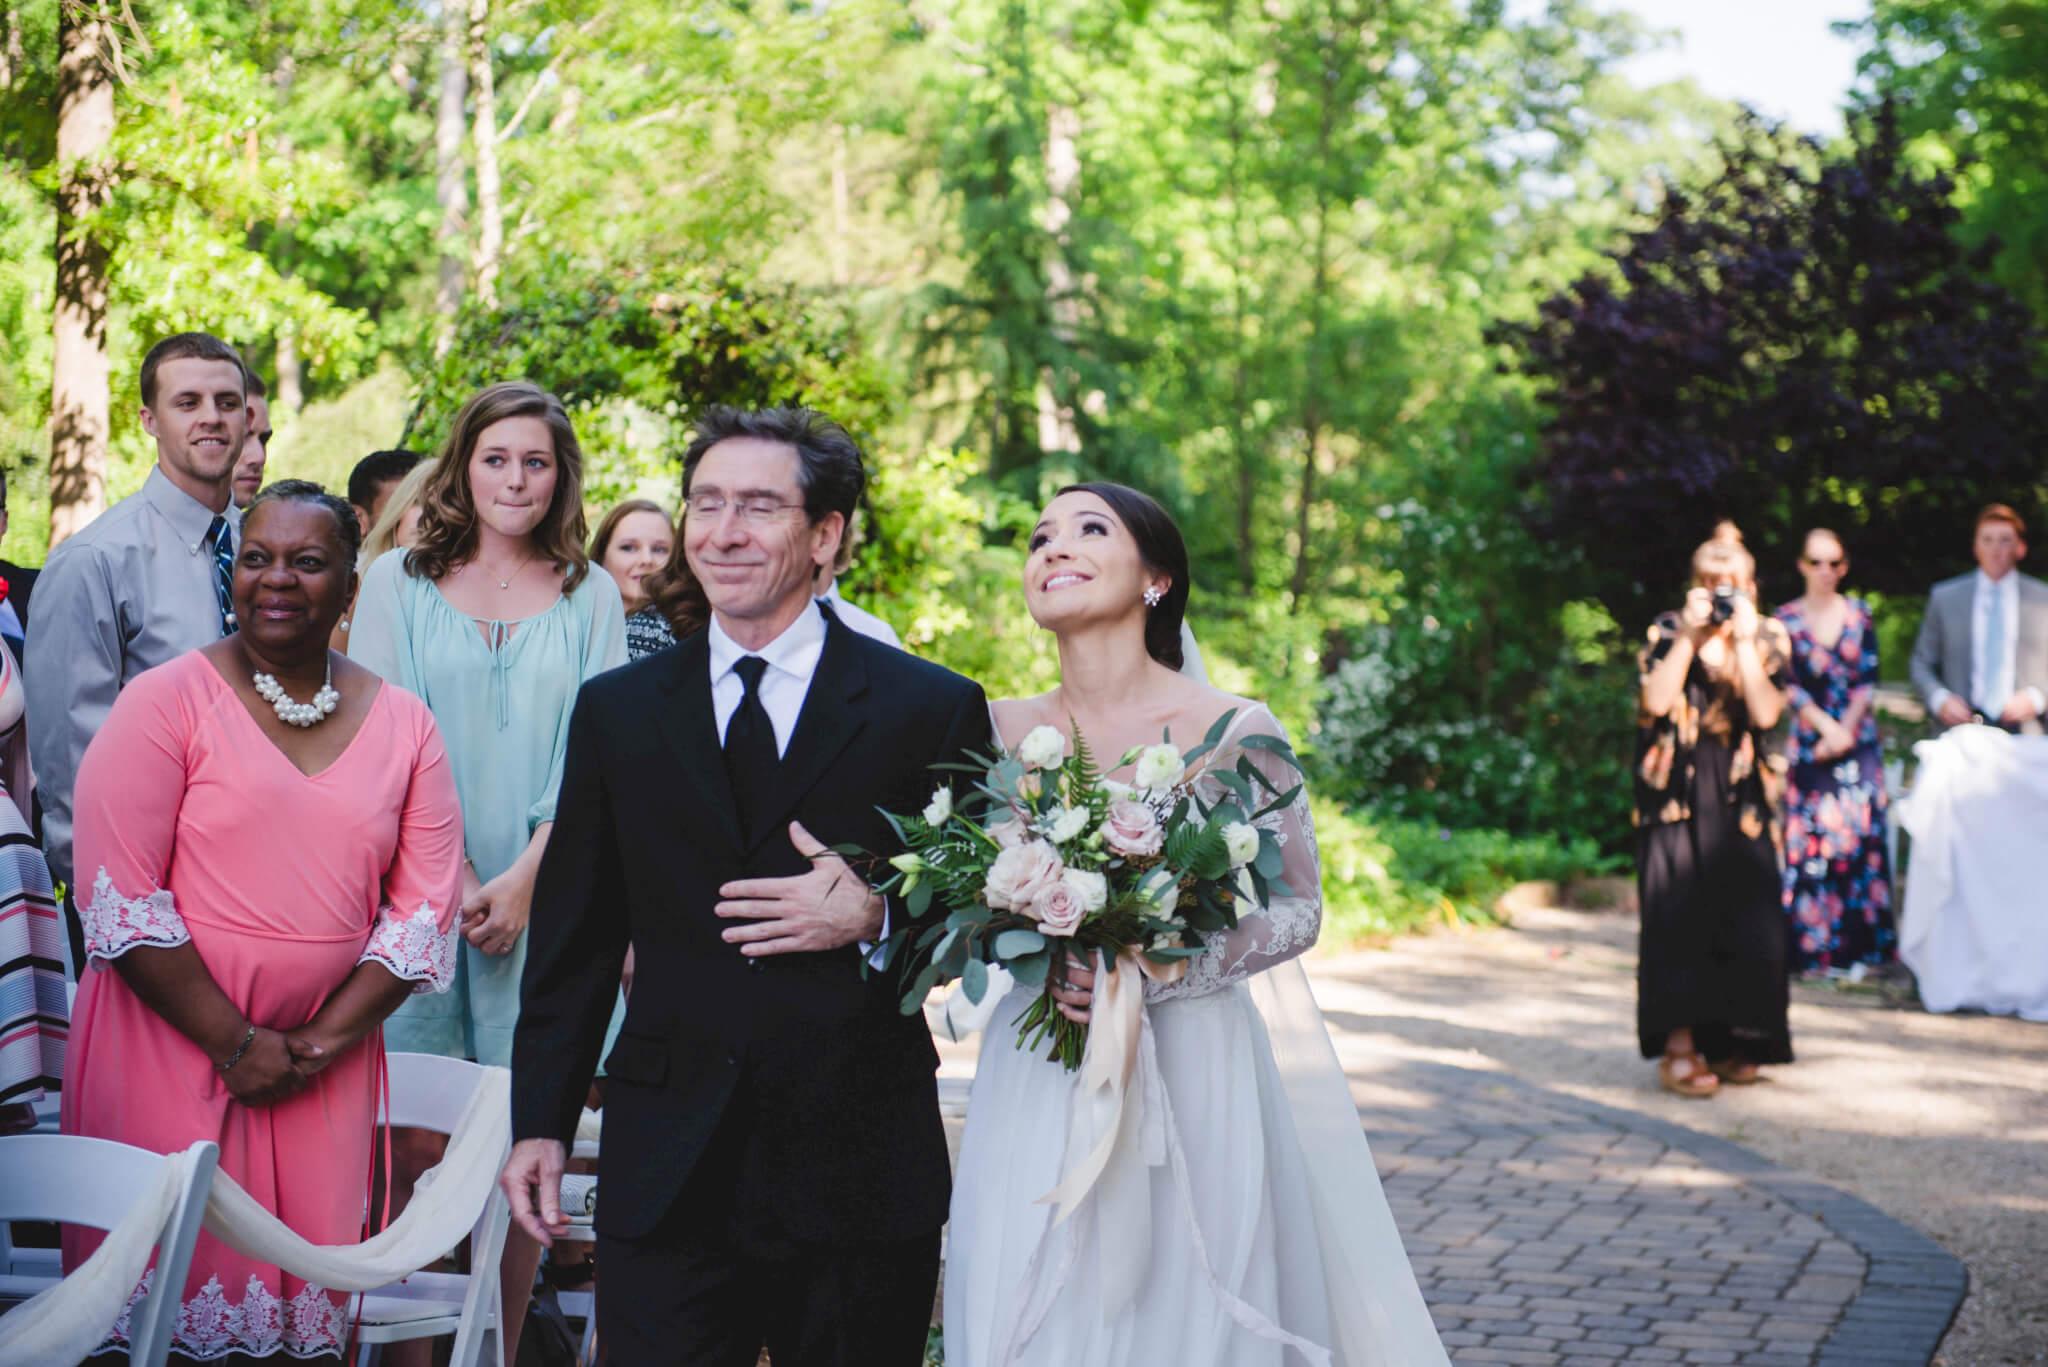 Glackin-Wedding-553.jpg